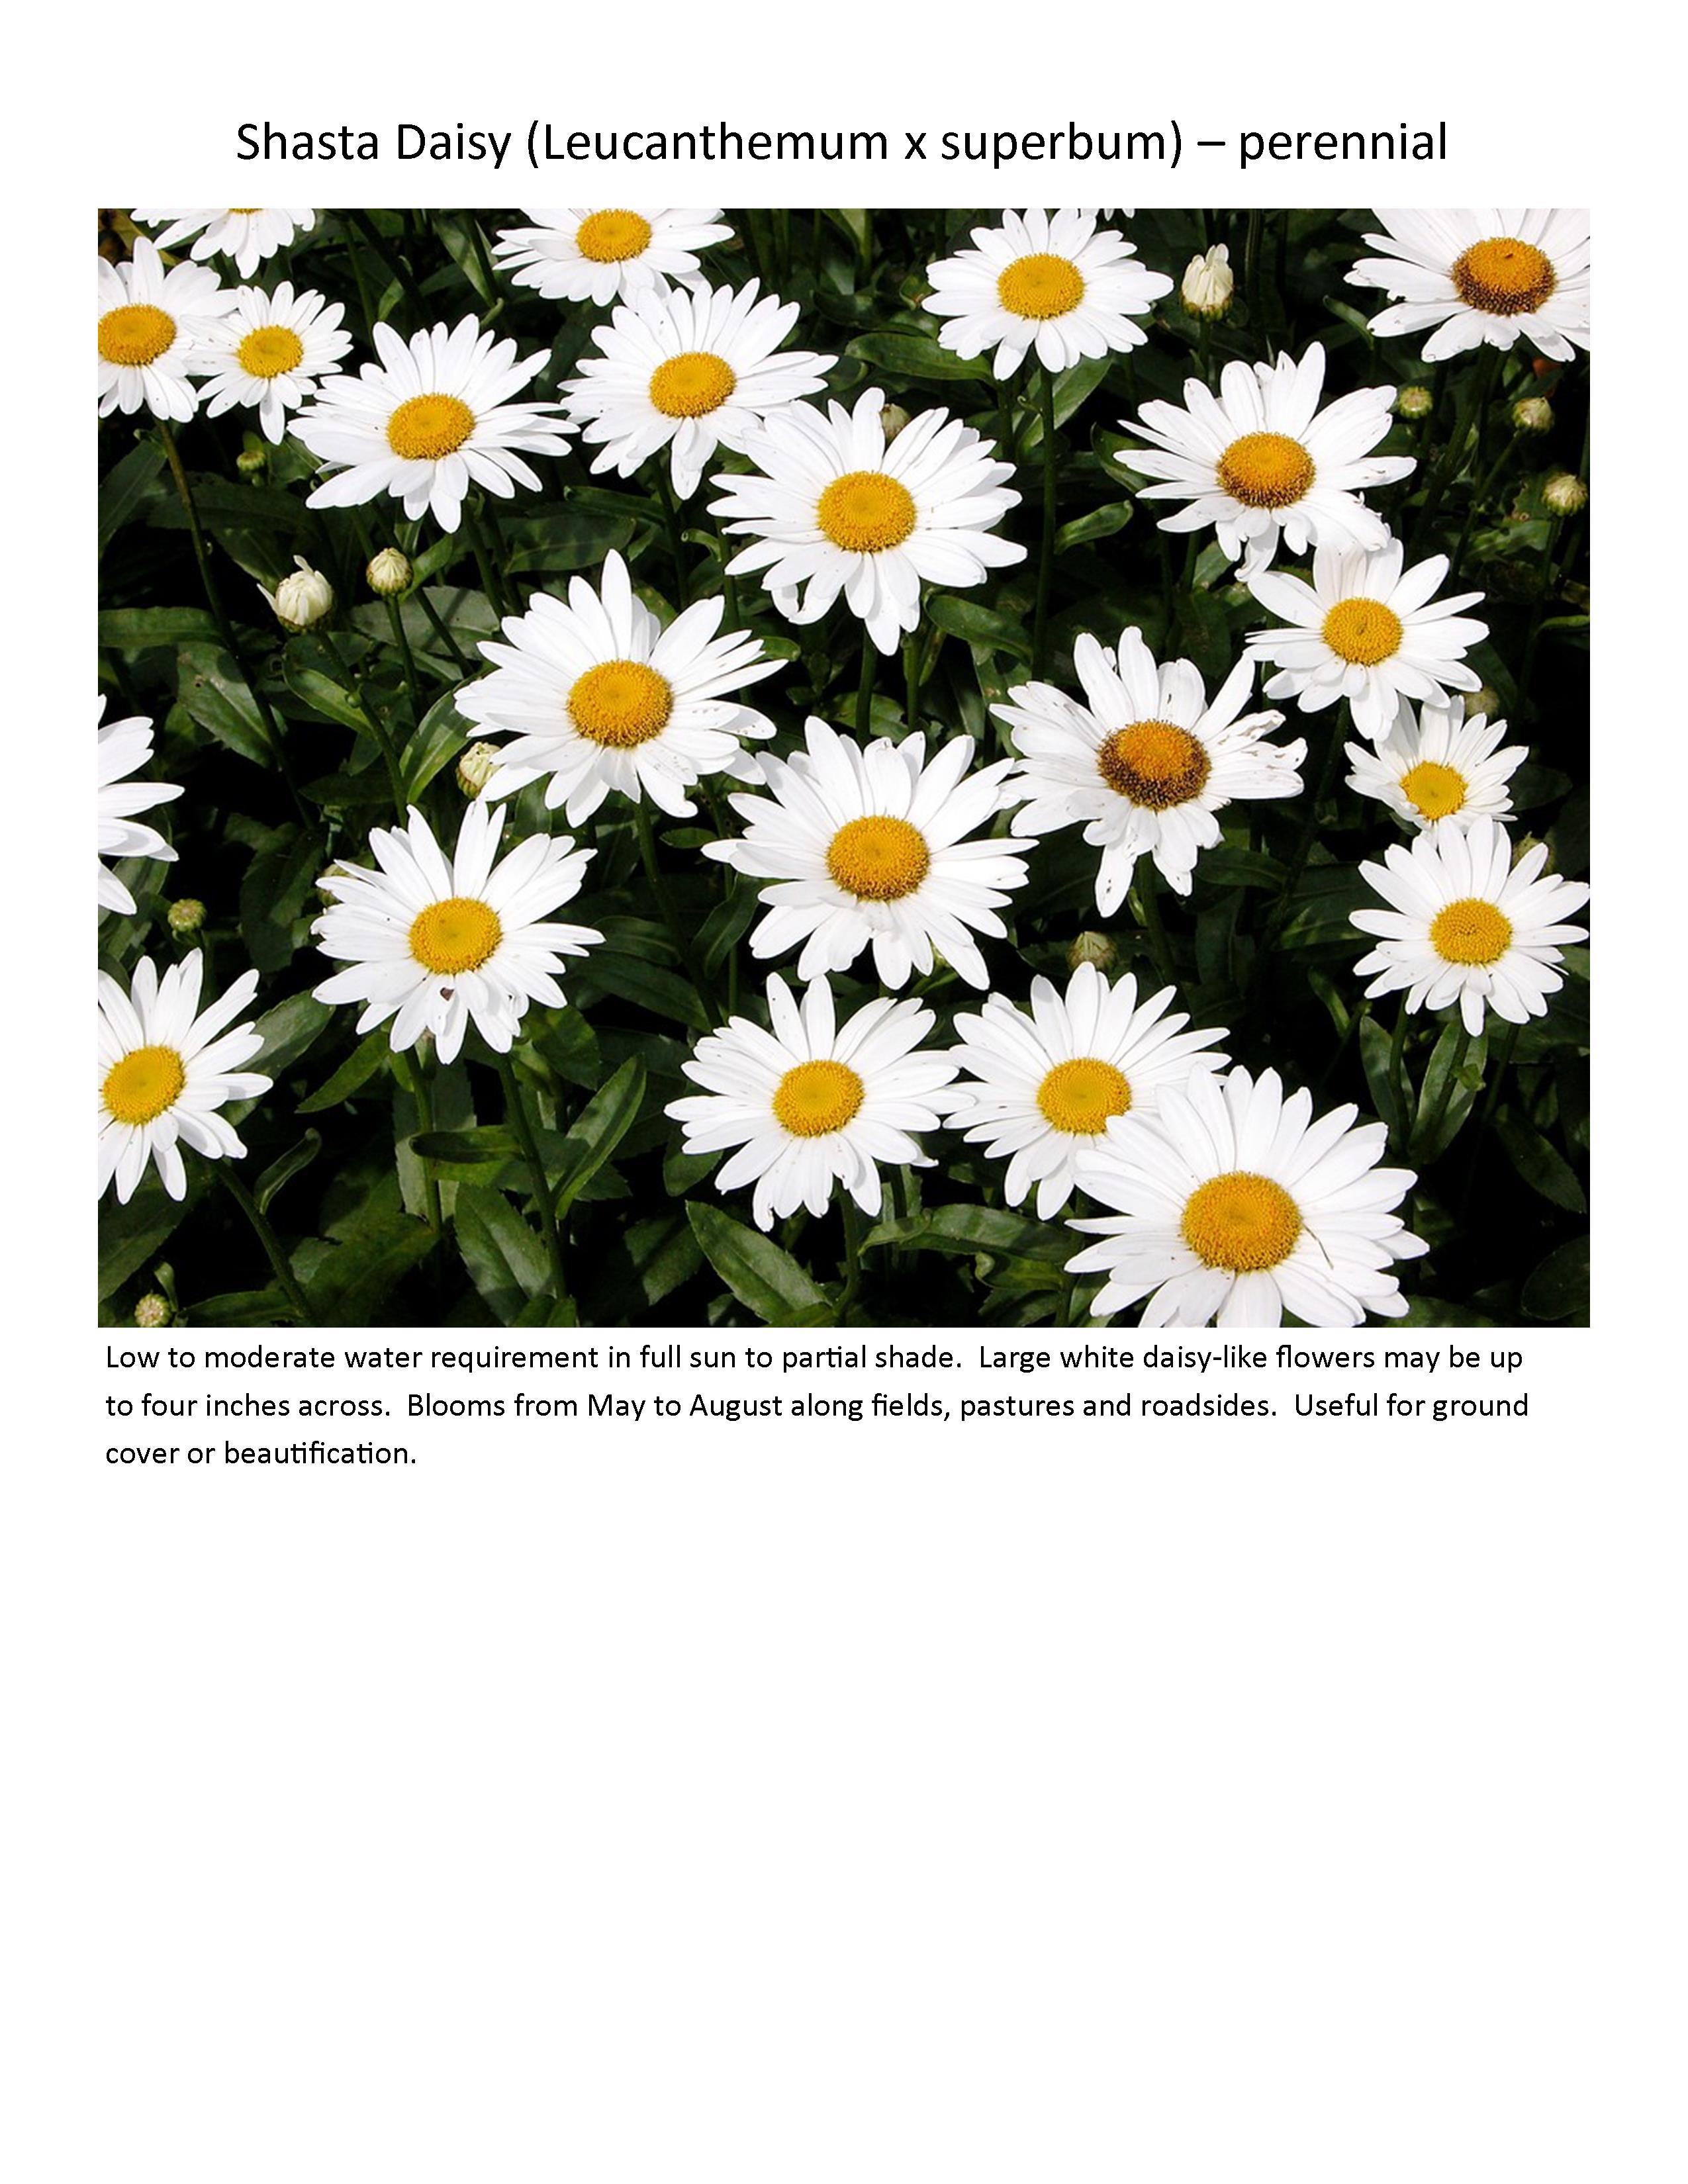 Wildflowers ladybug anew green izmirmasajfo Image collections